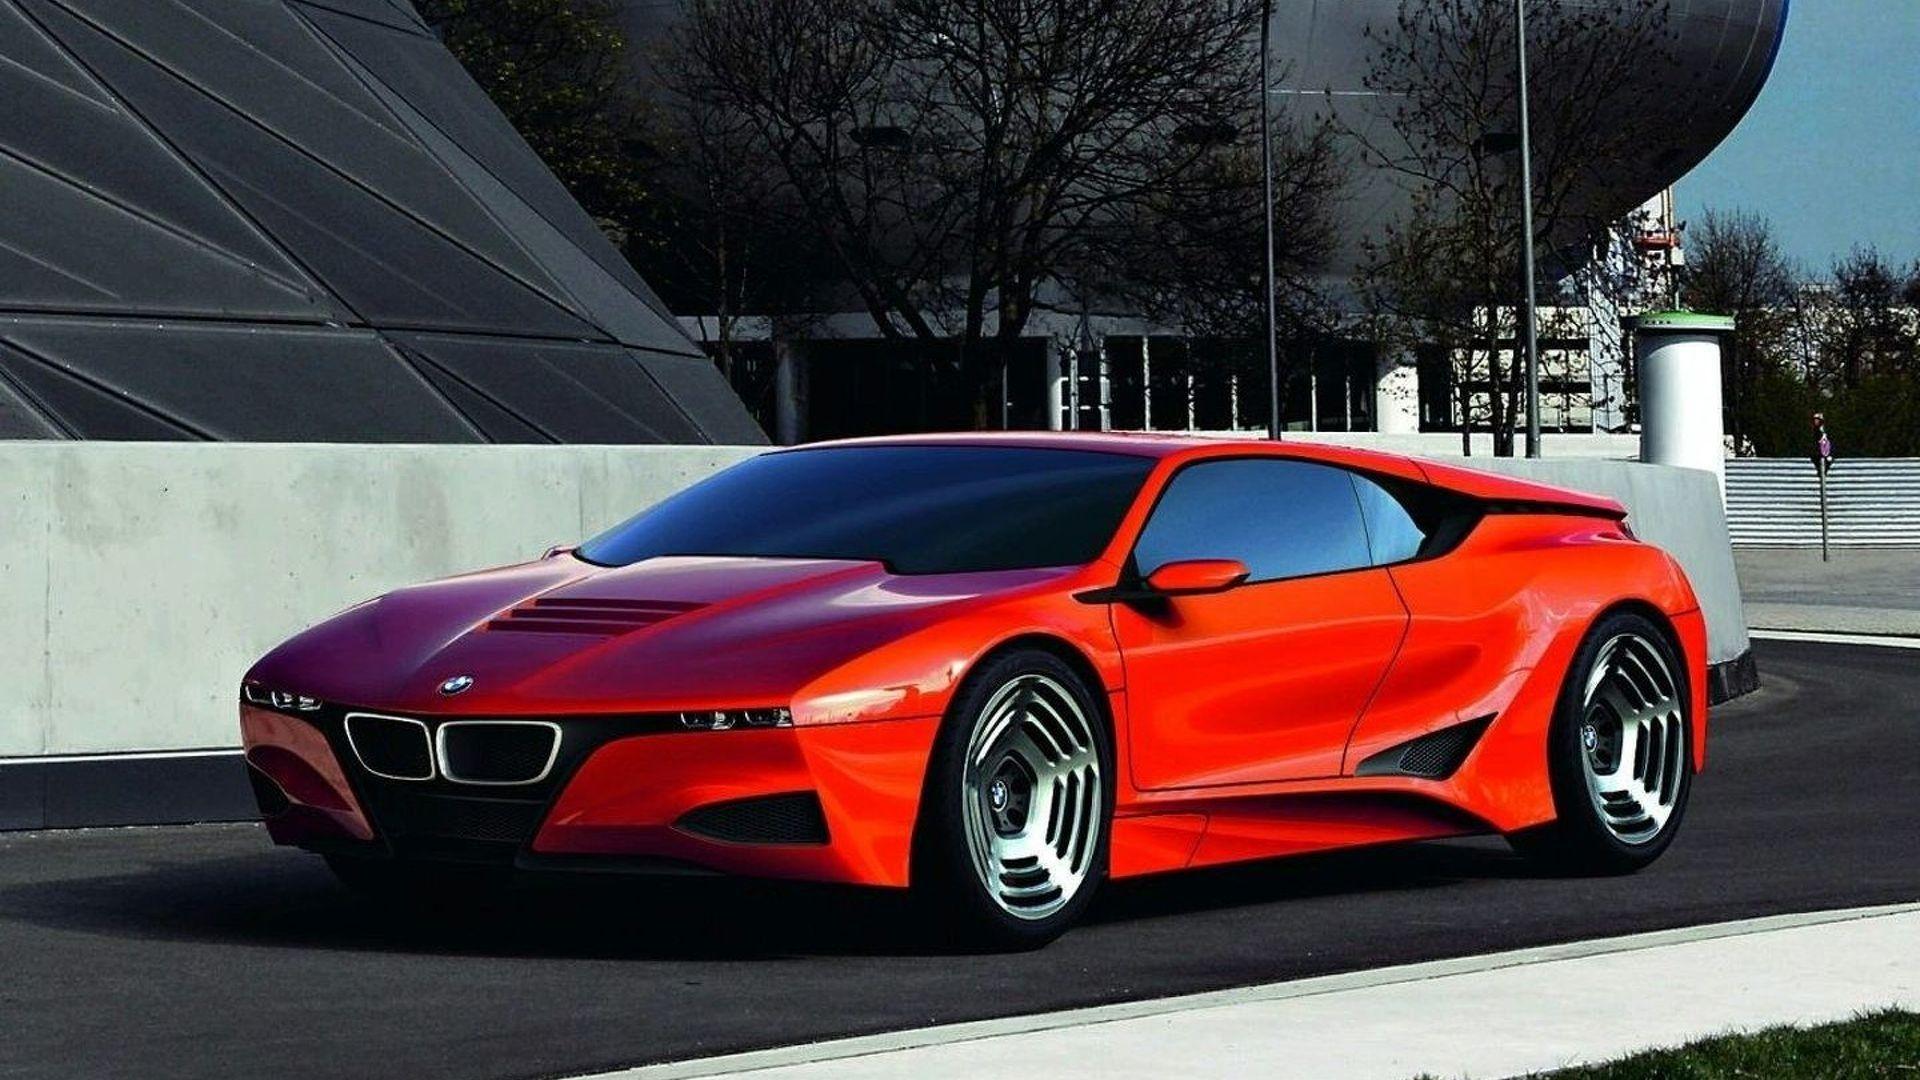 2019 Bmw M1 Much Rumoured Supercar Flagship For Bmw Interior